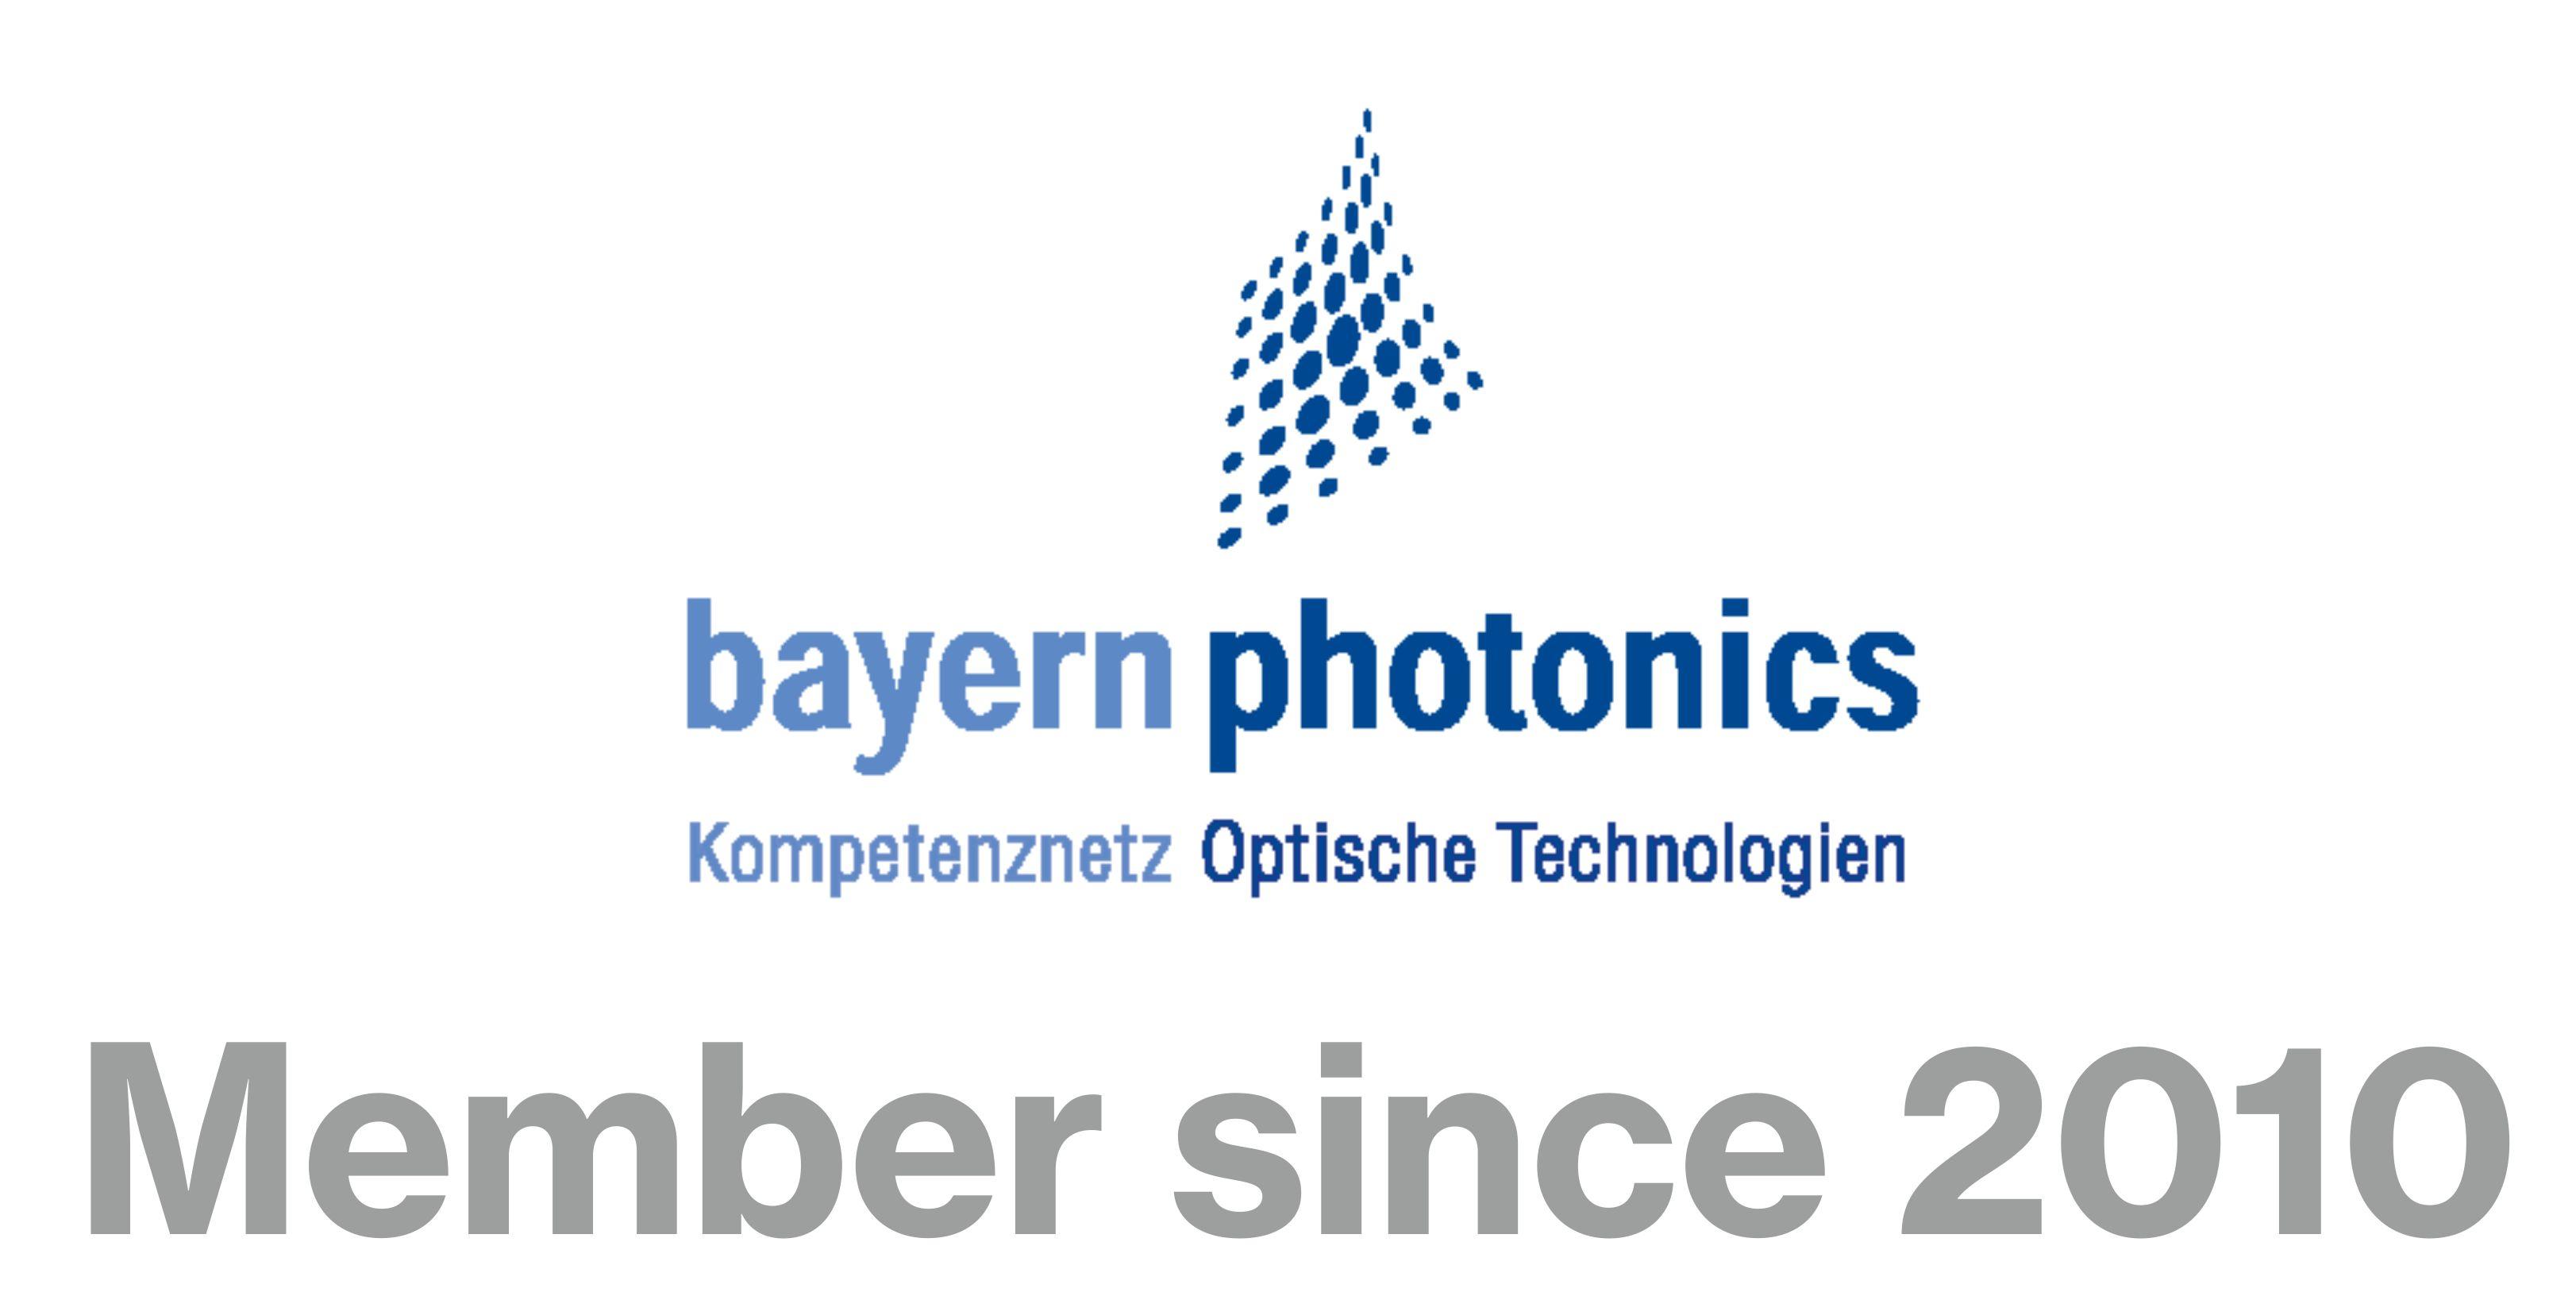 bayern photonics logo englisch